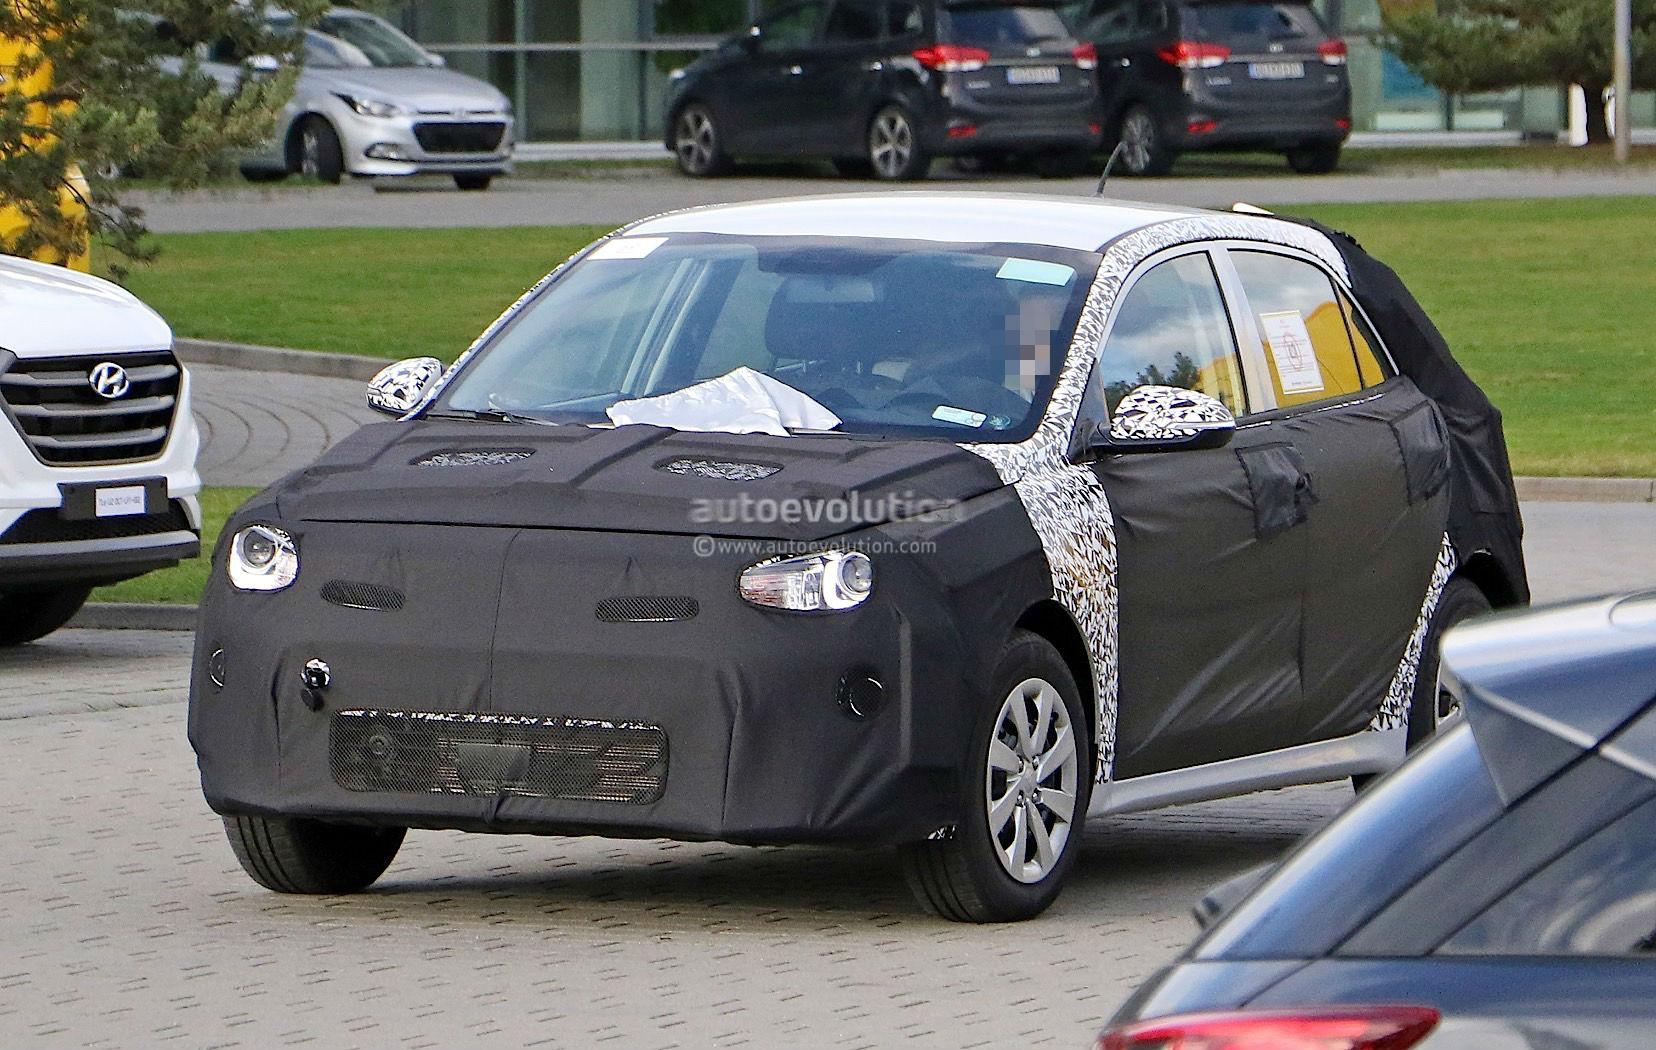 First Spyshots of the 2017 Kia Rio Before It Starts Testing